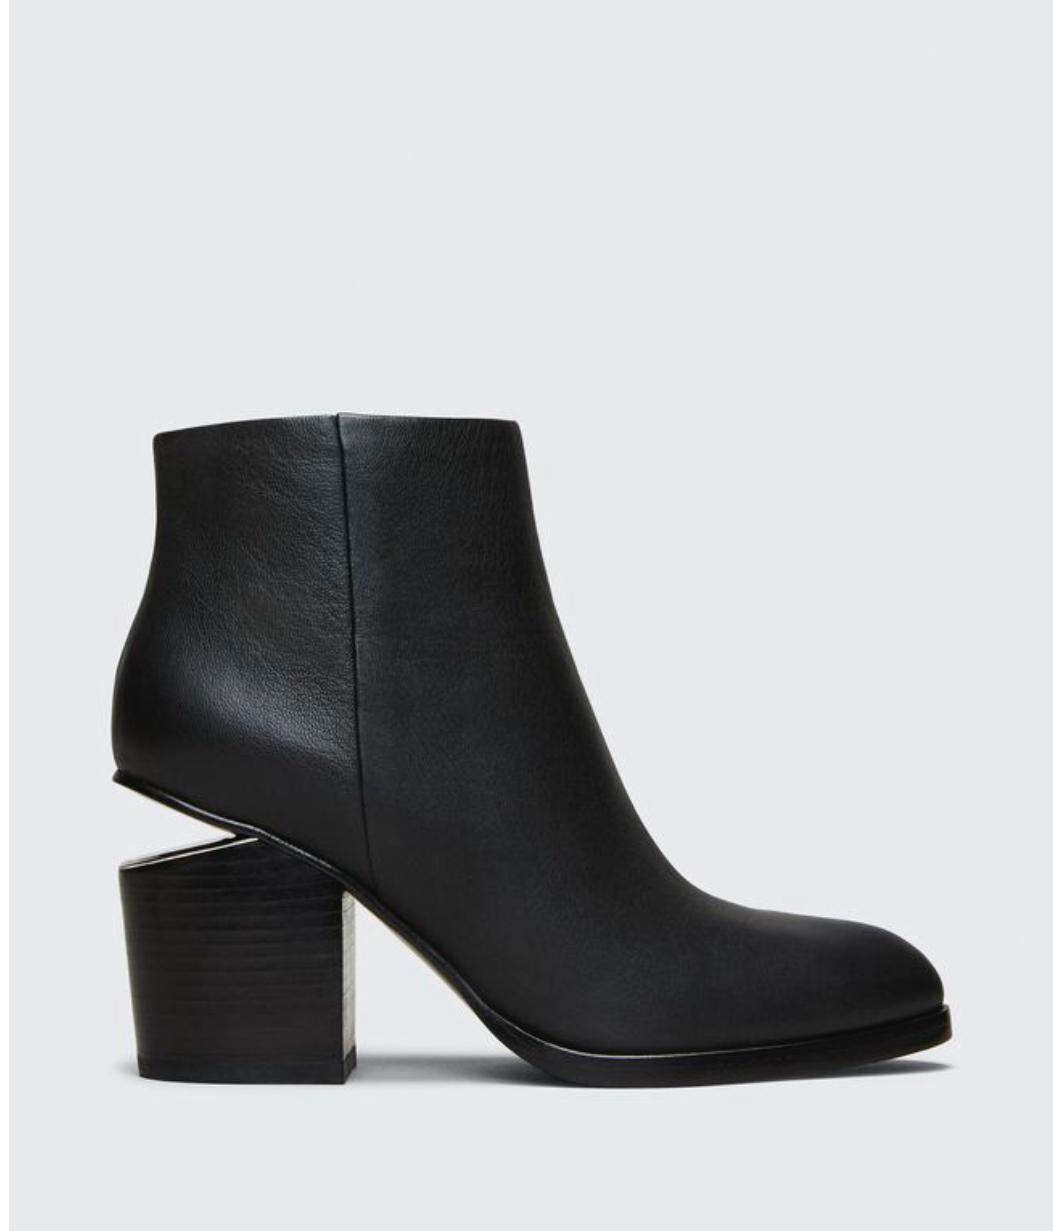 Alexander Wang Gabi Boot Rhodium  $950